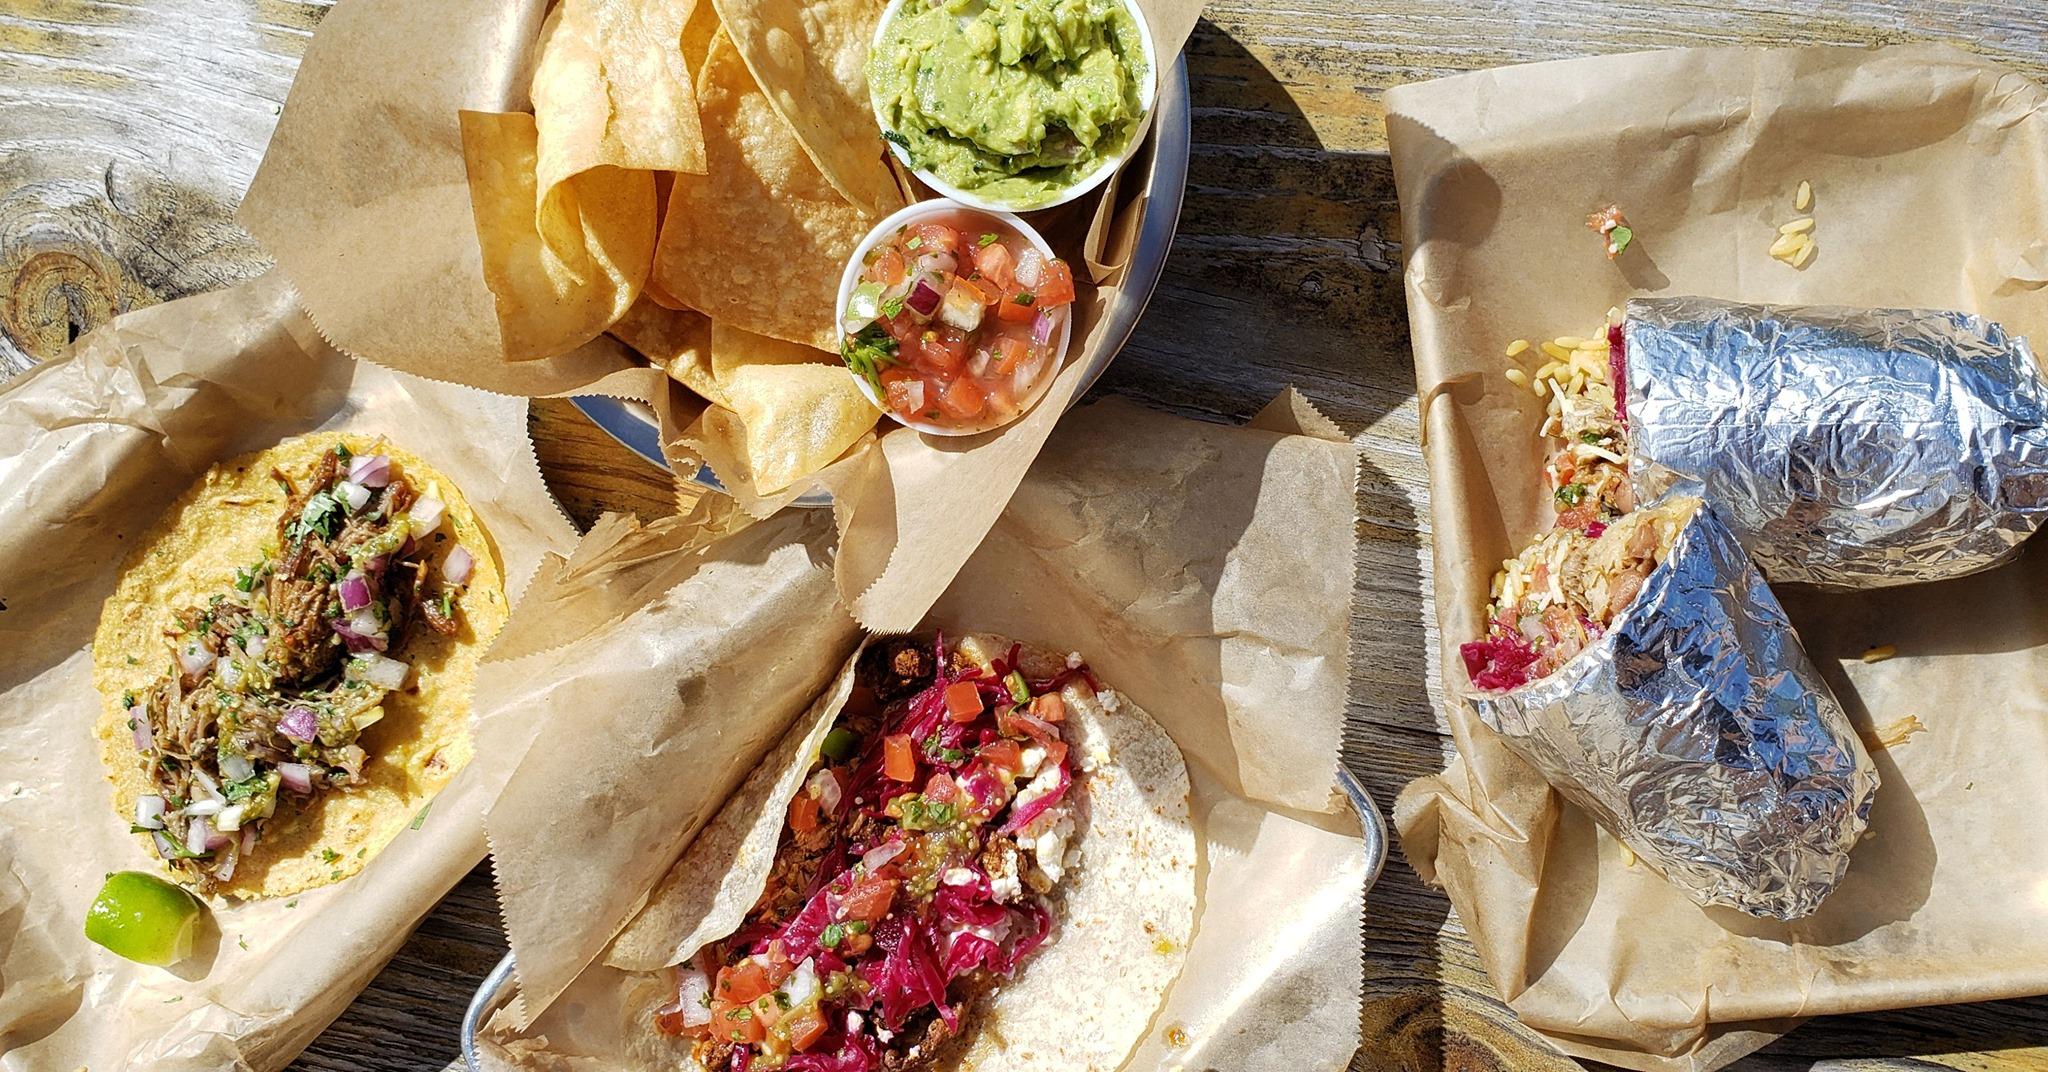 Poppo's Taqueria's menu' is simple, offering build-your-own tacos, burritos, quesadillas, or bowls.